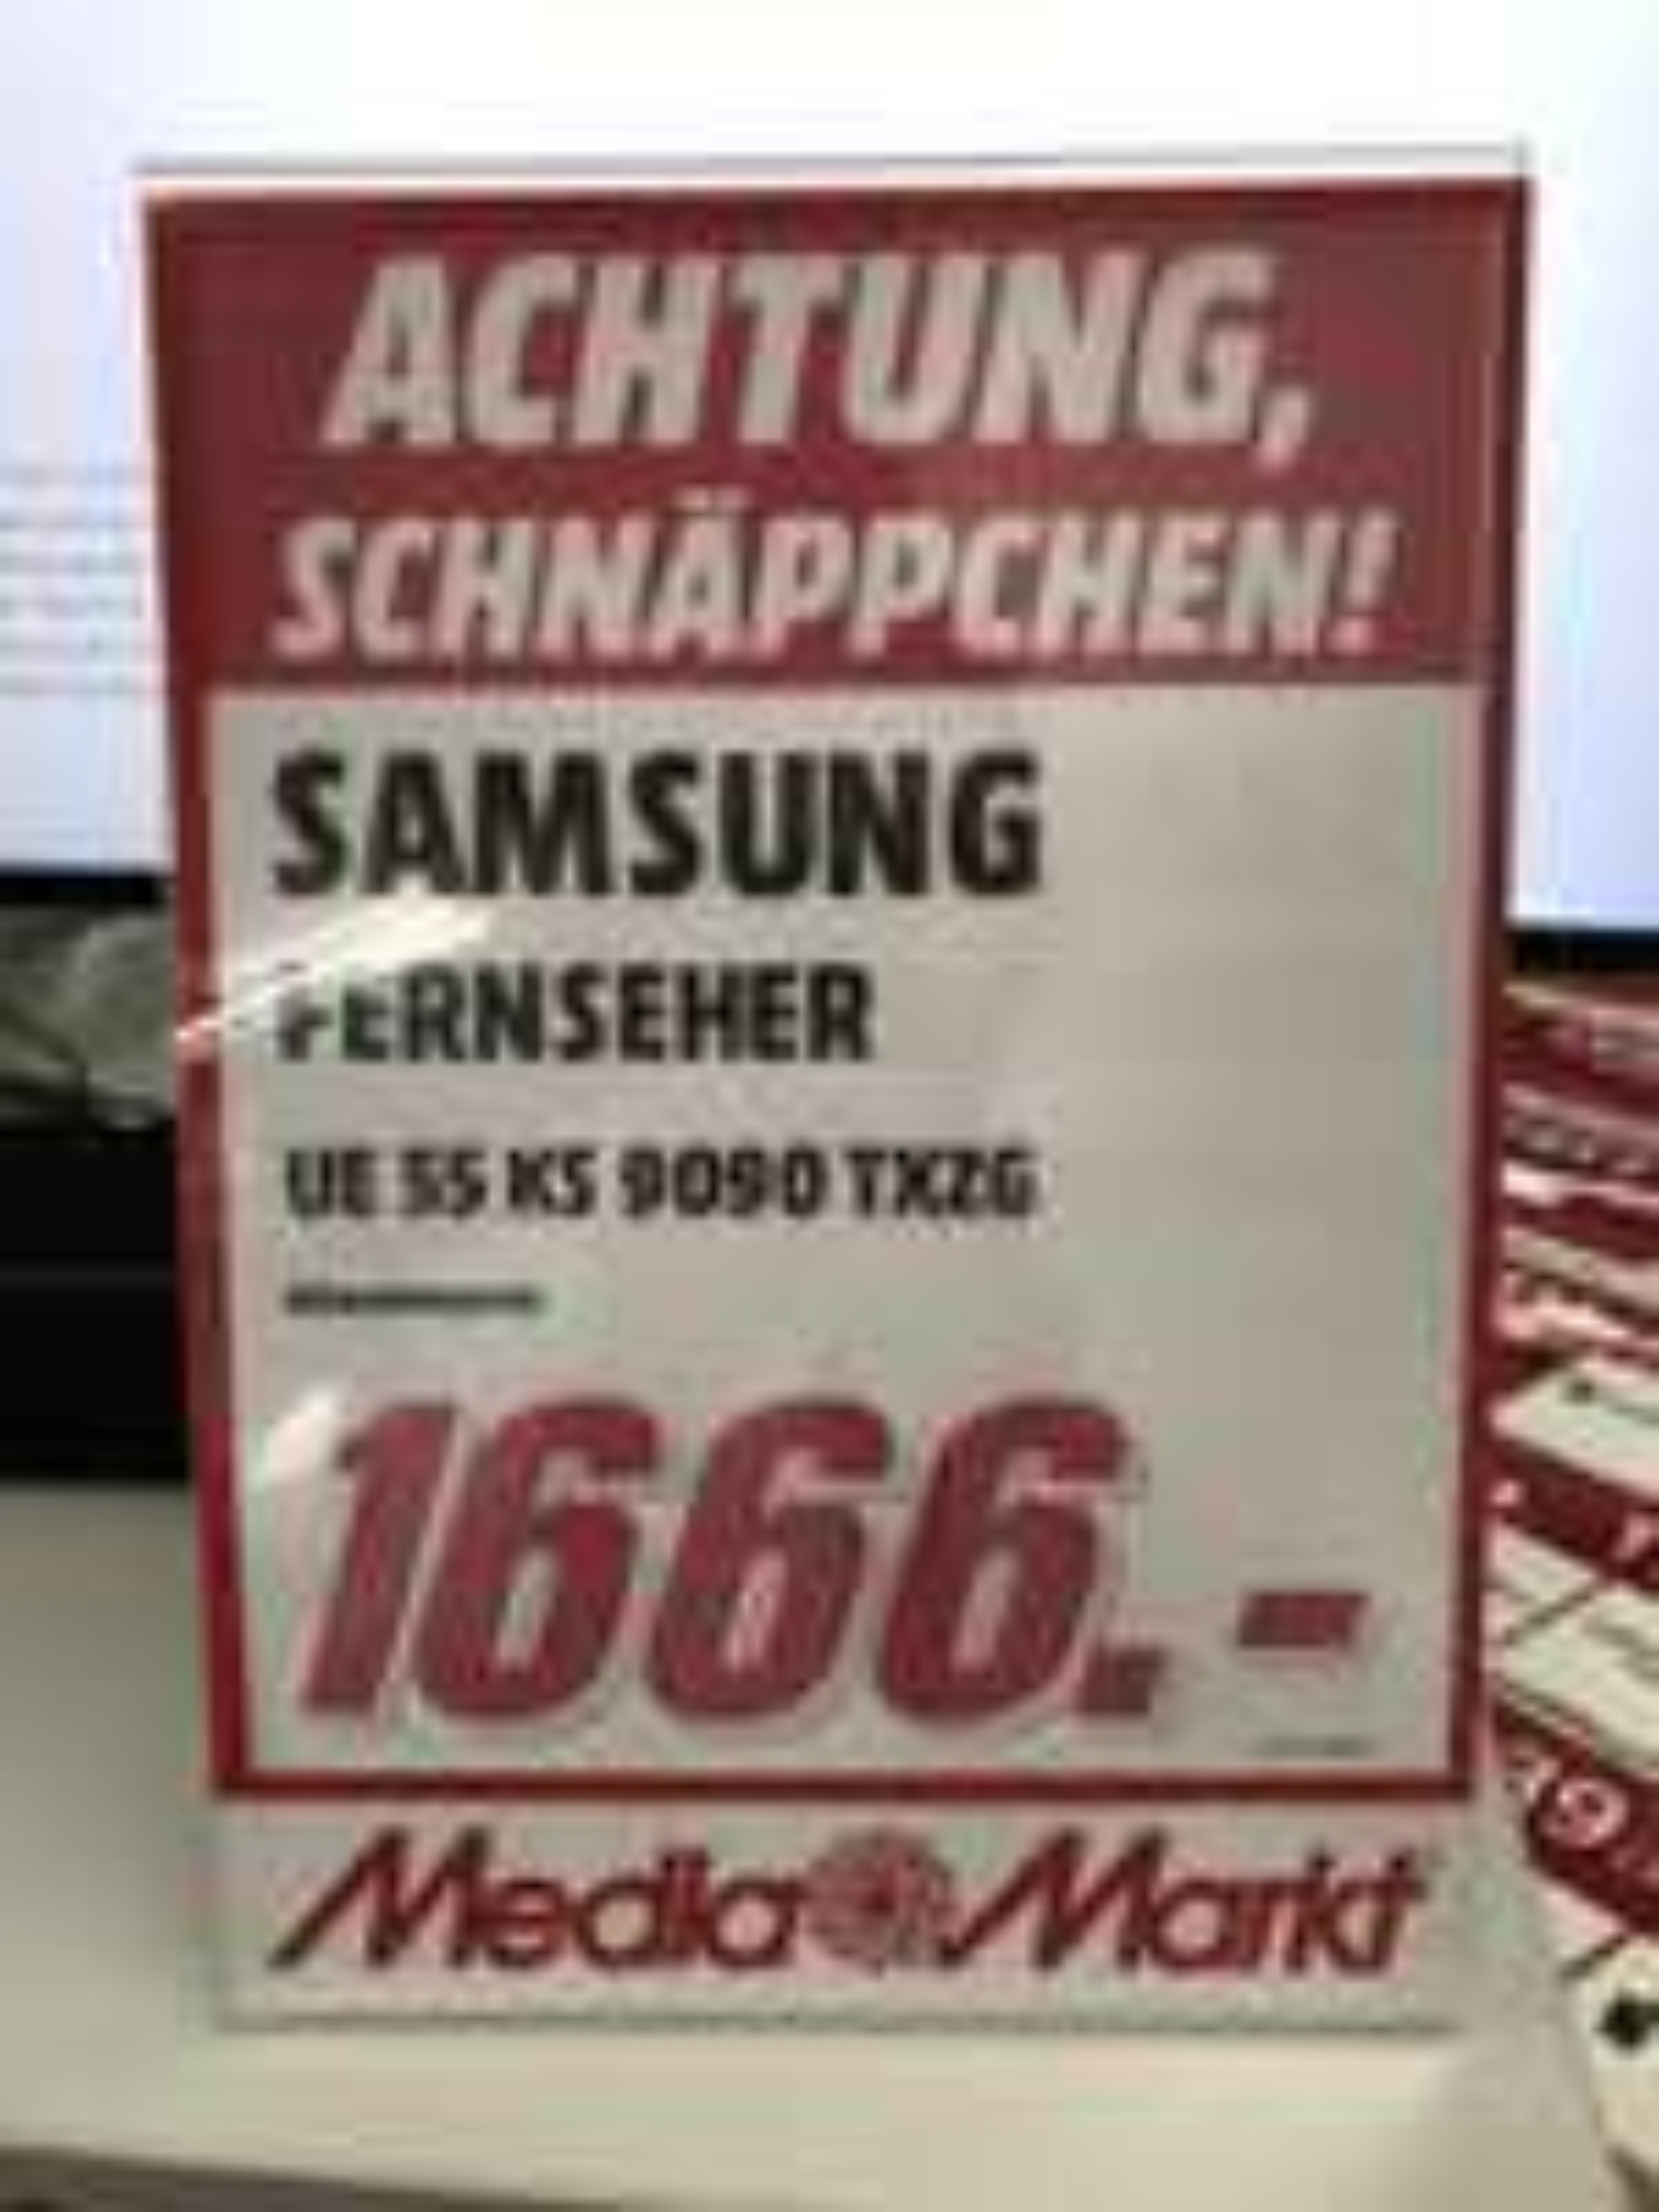 Samsung UE55KS9090 + Galaxy S7 (MM Wiesbaden 2)